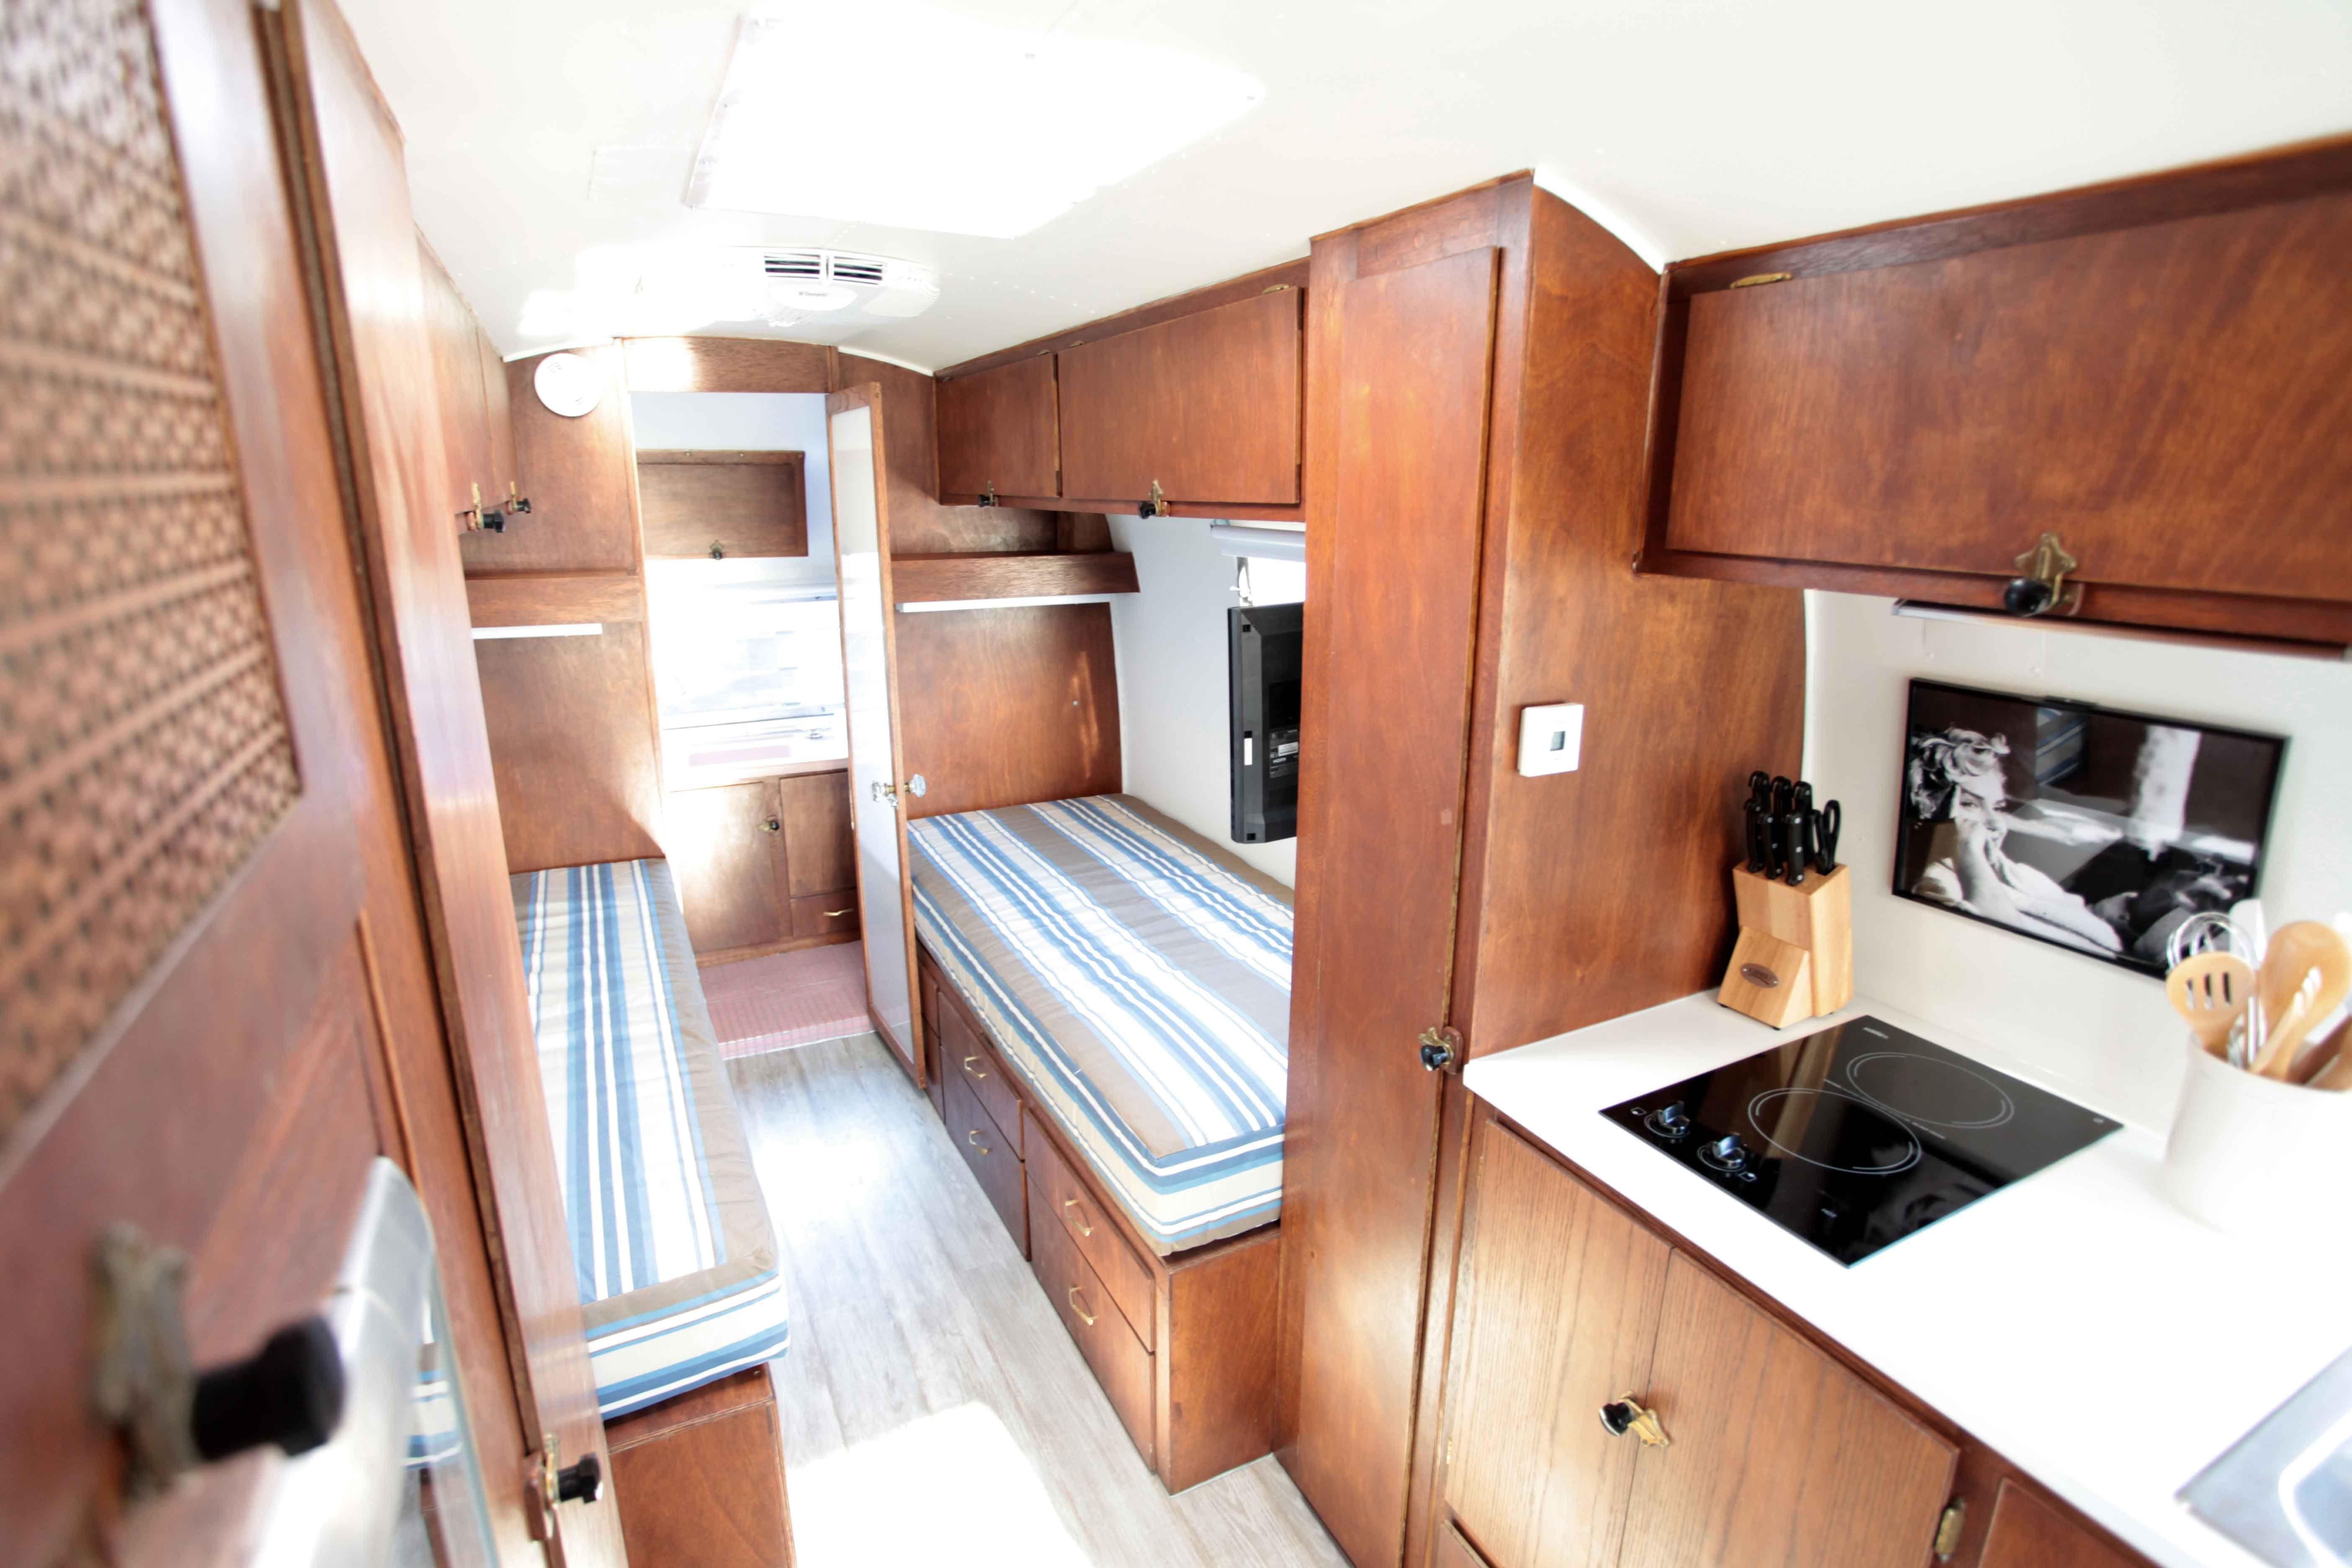 IMG_7700 | AirStream | Airstream trailers, Airstream interior, Airstream